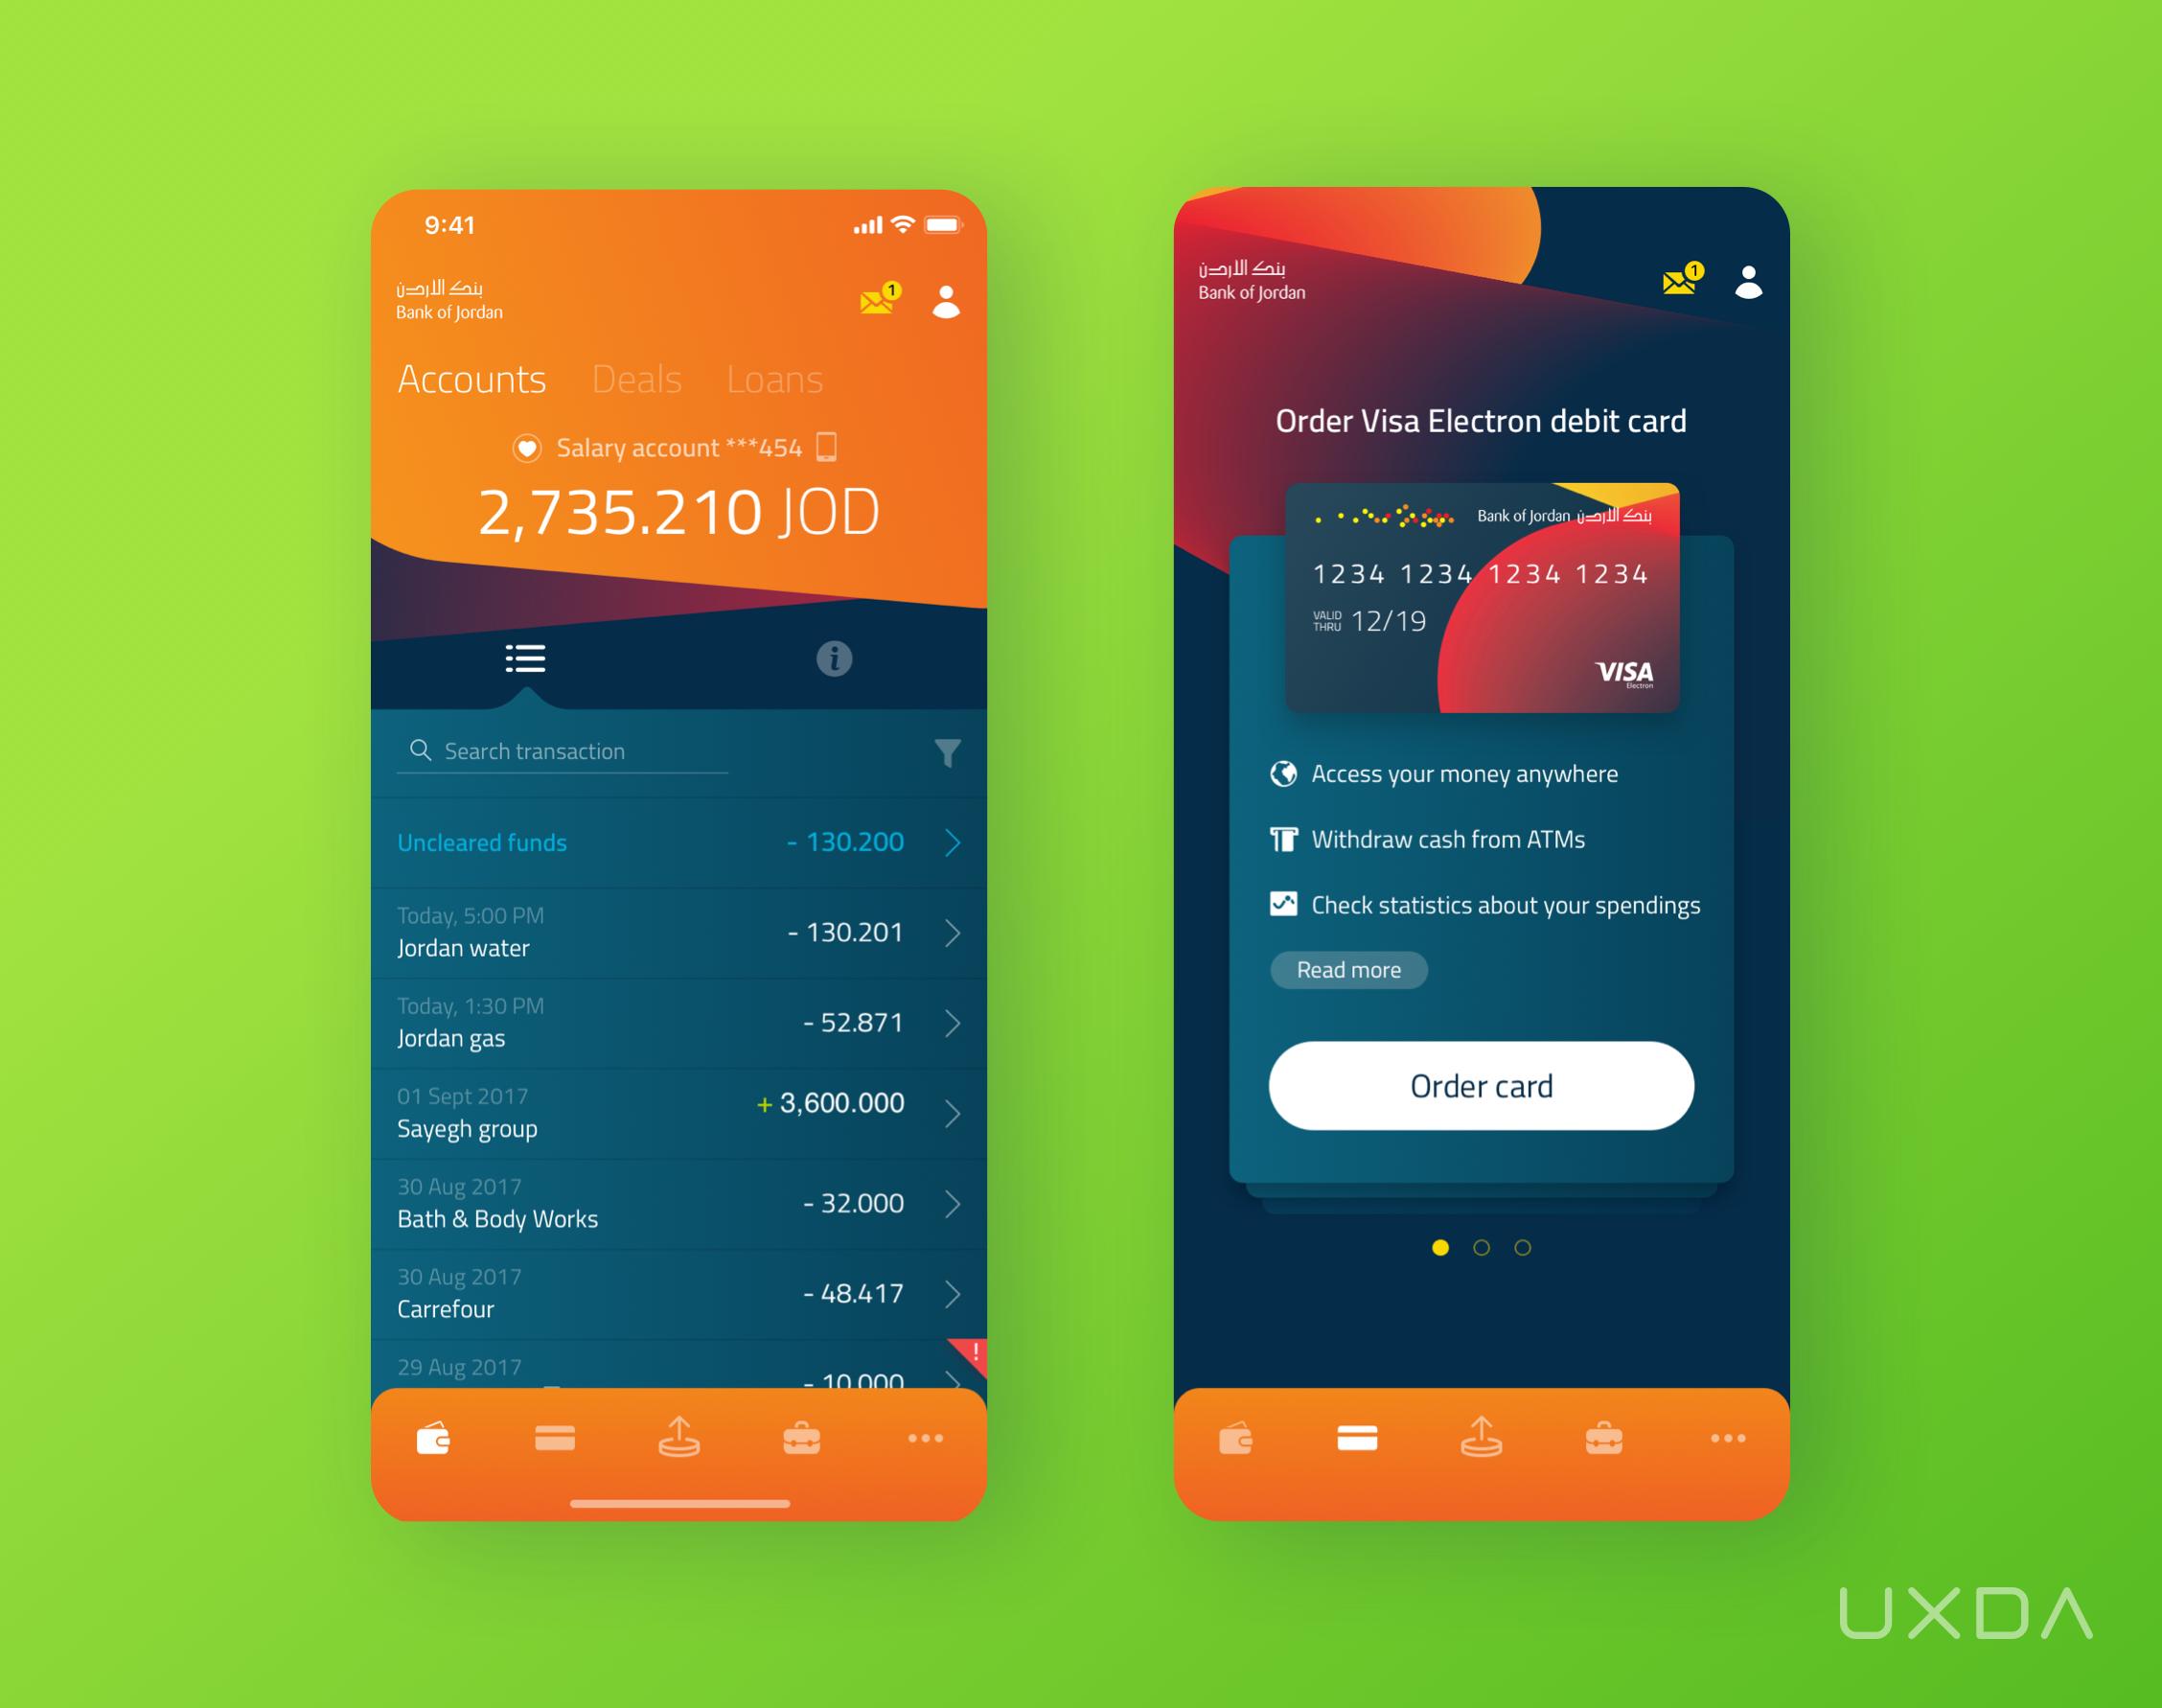 mobile-banking-ux-case-study-uxda-10.jpg